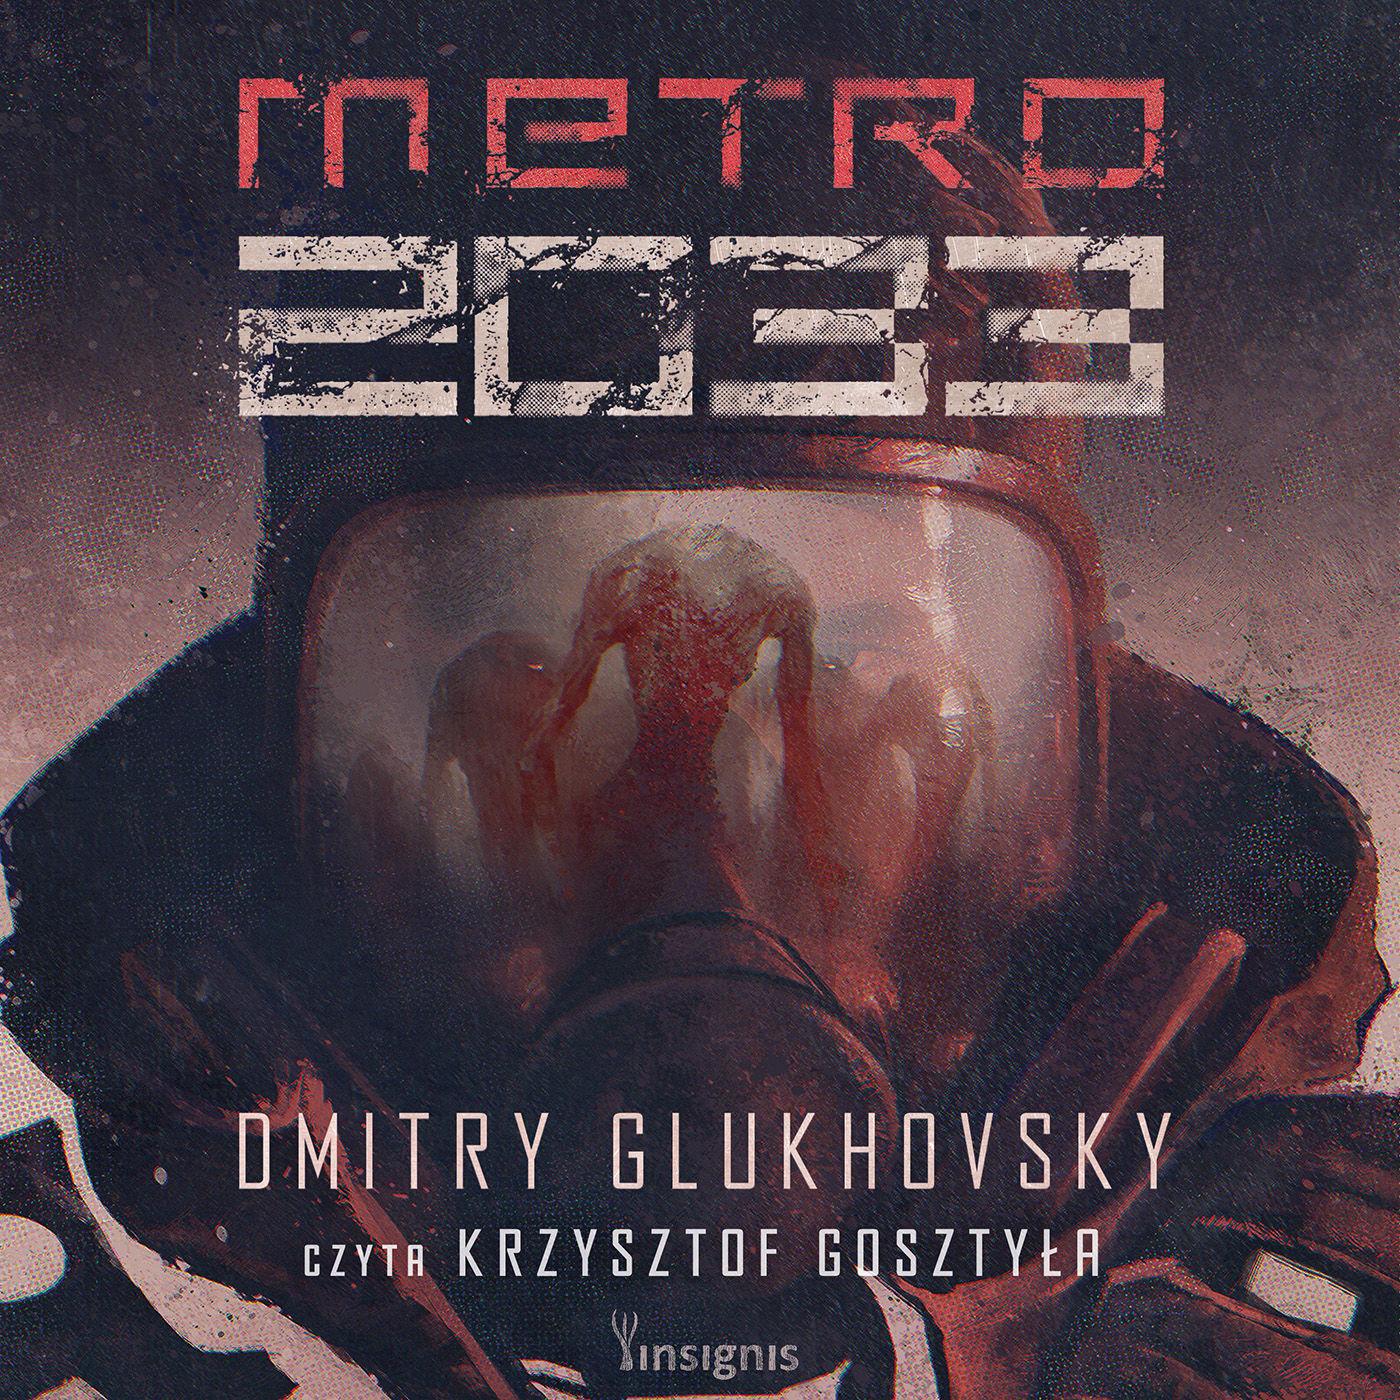 Metro 2033 - Dmitry Glukhovsky - audiobook